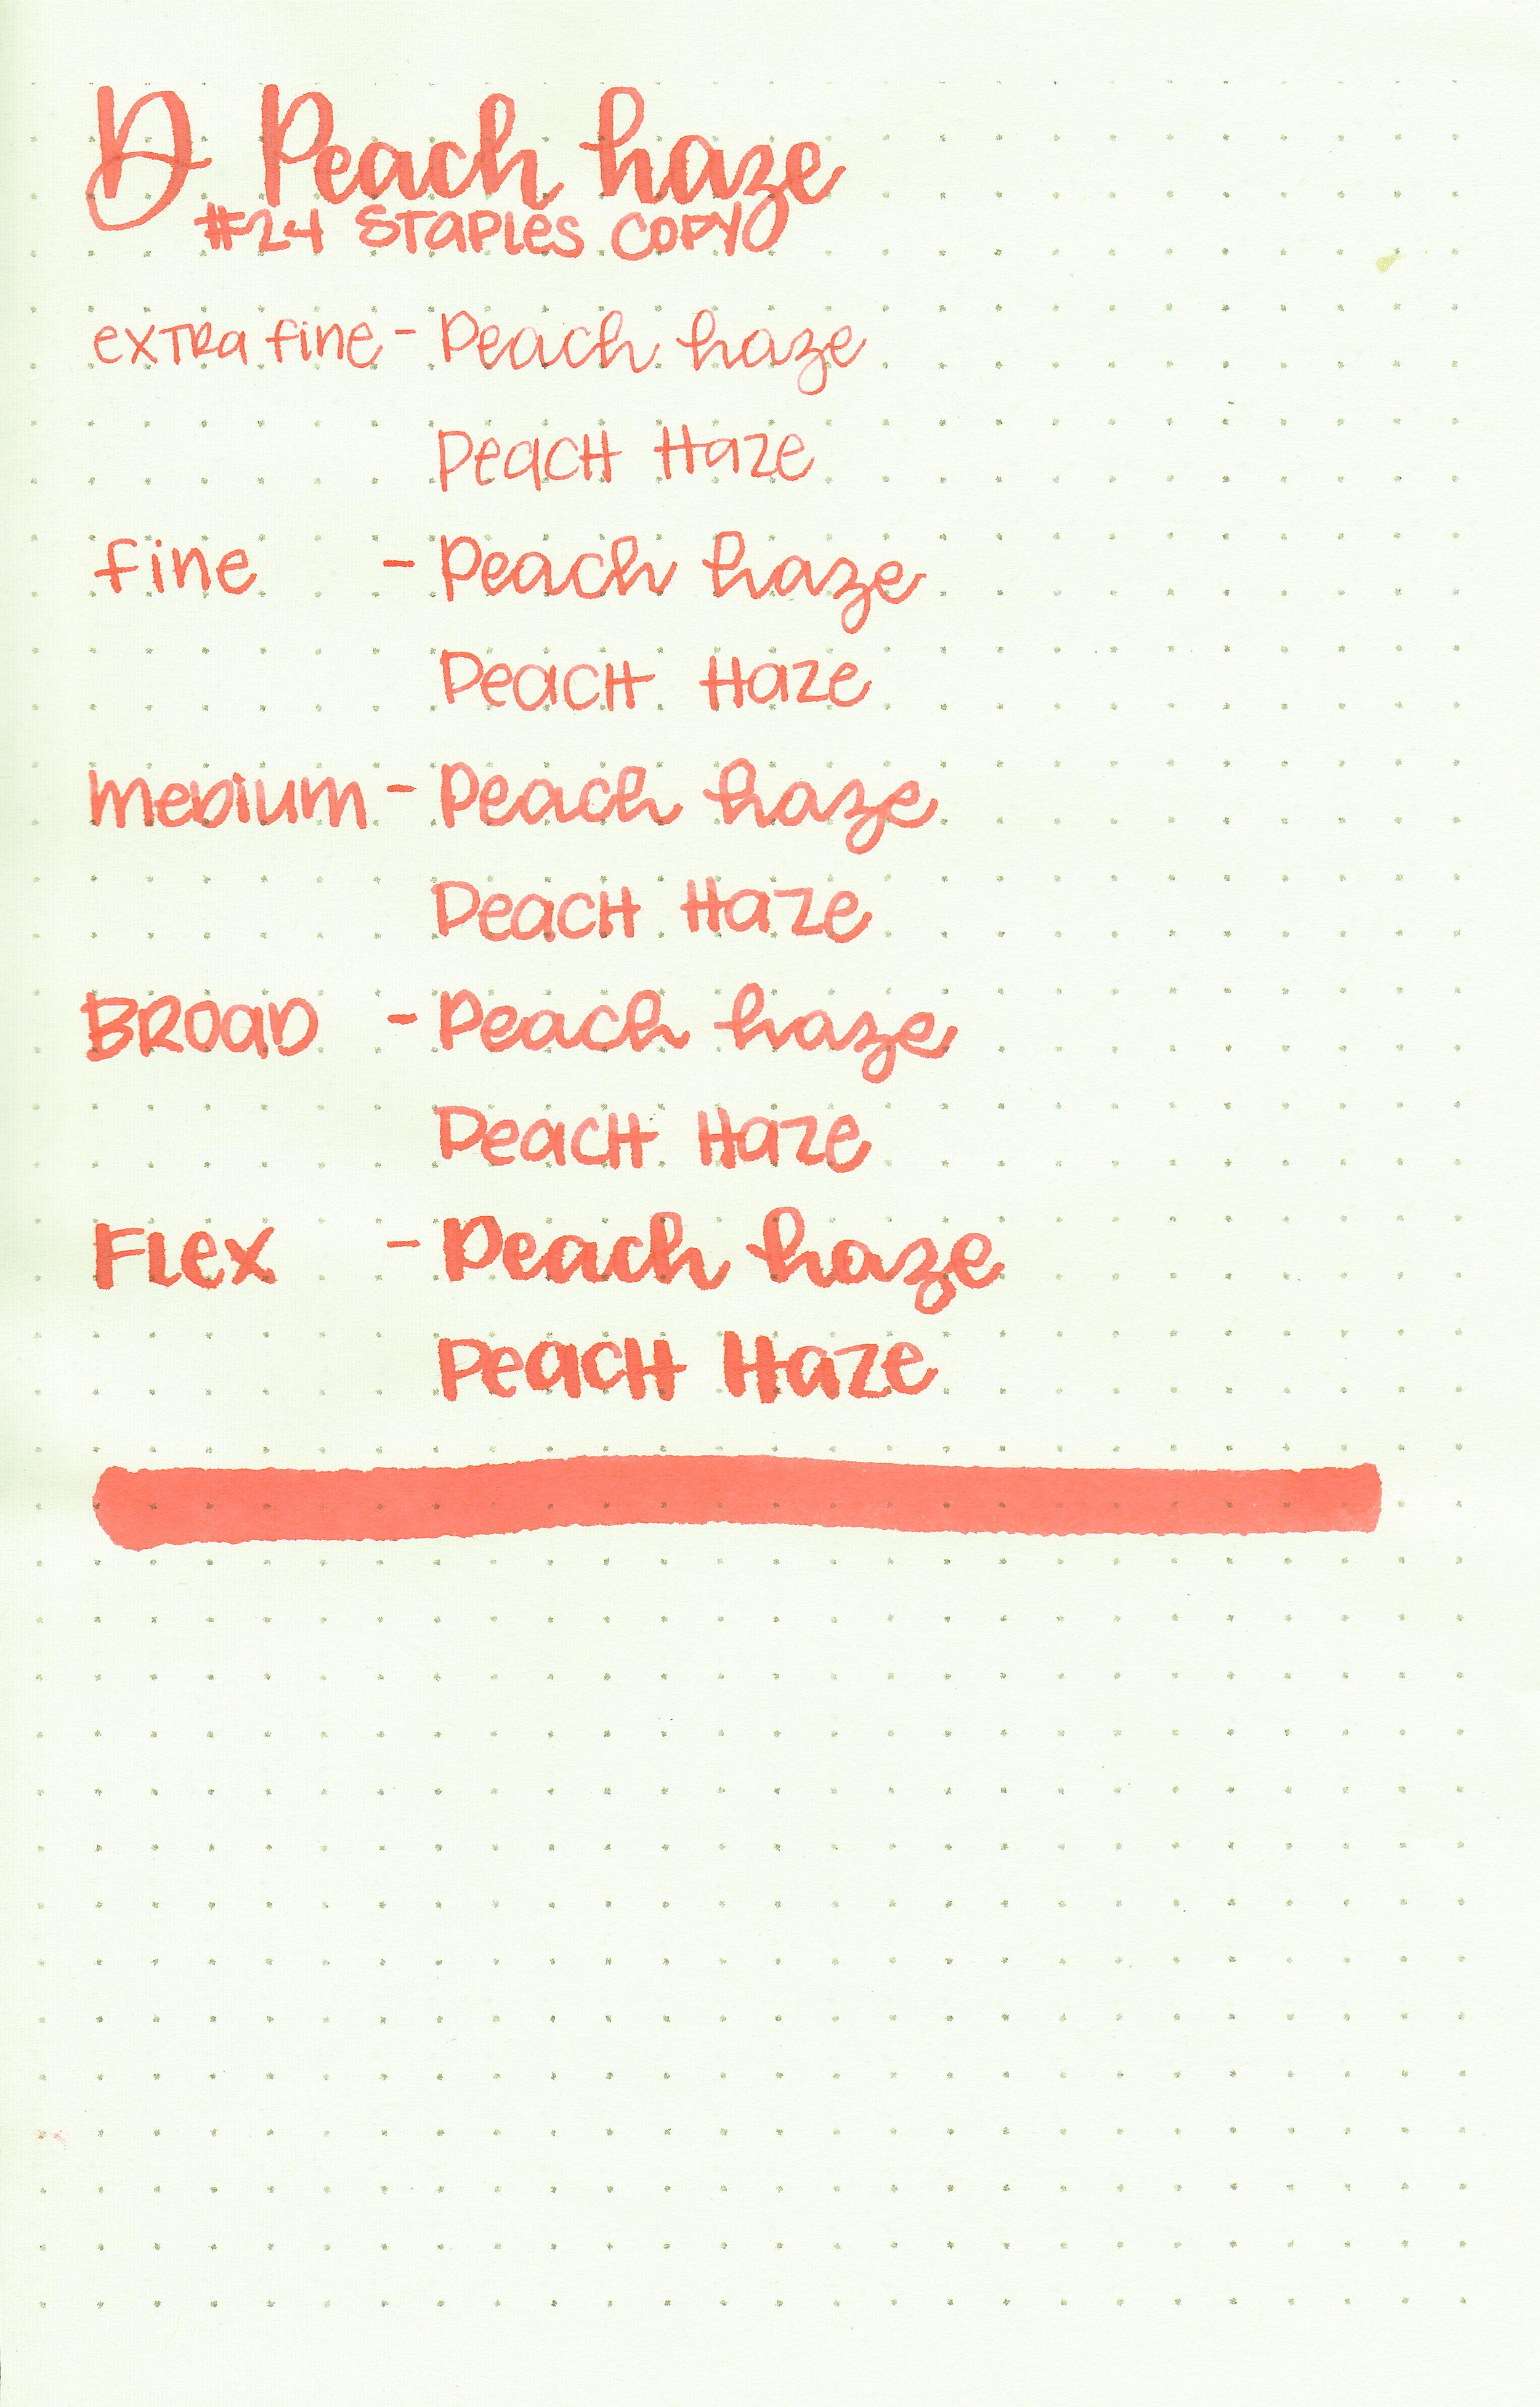 d-peach-haze-13.jpg